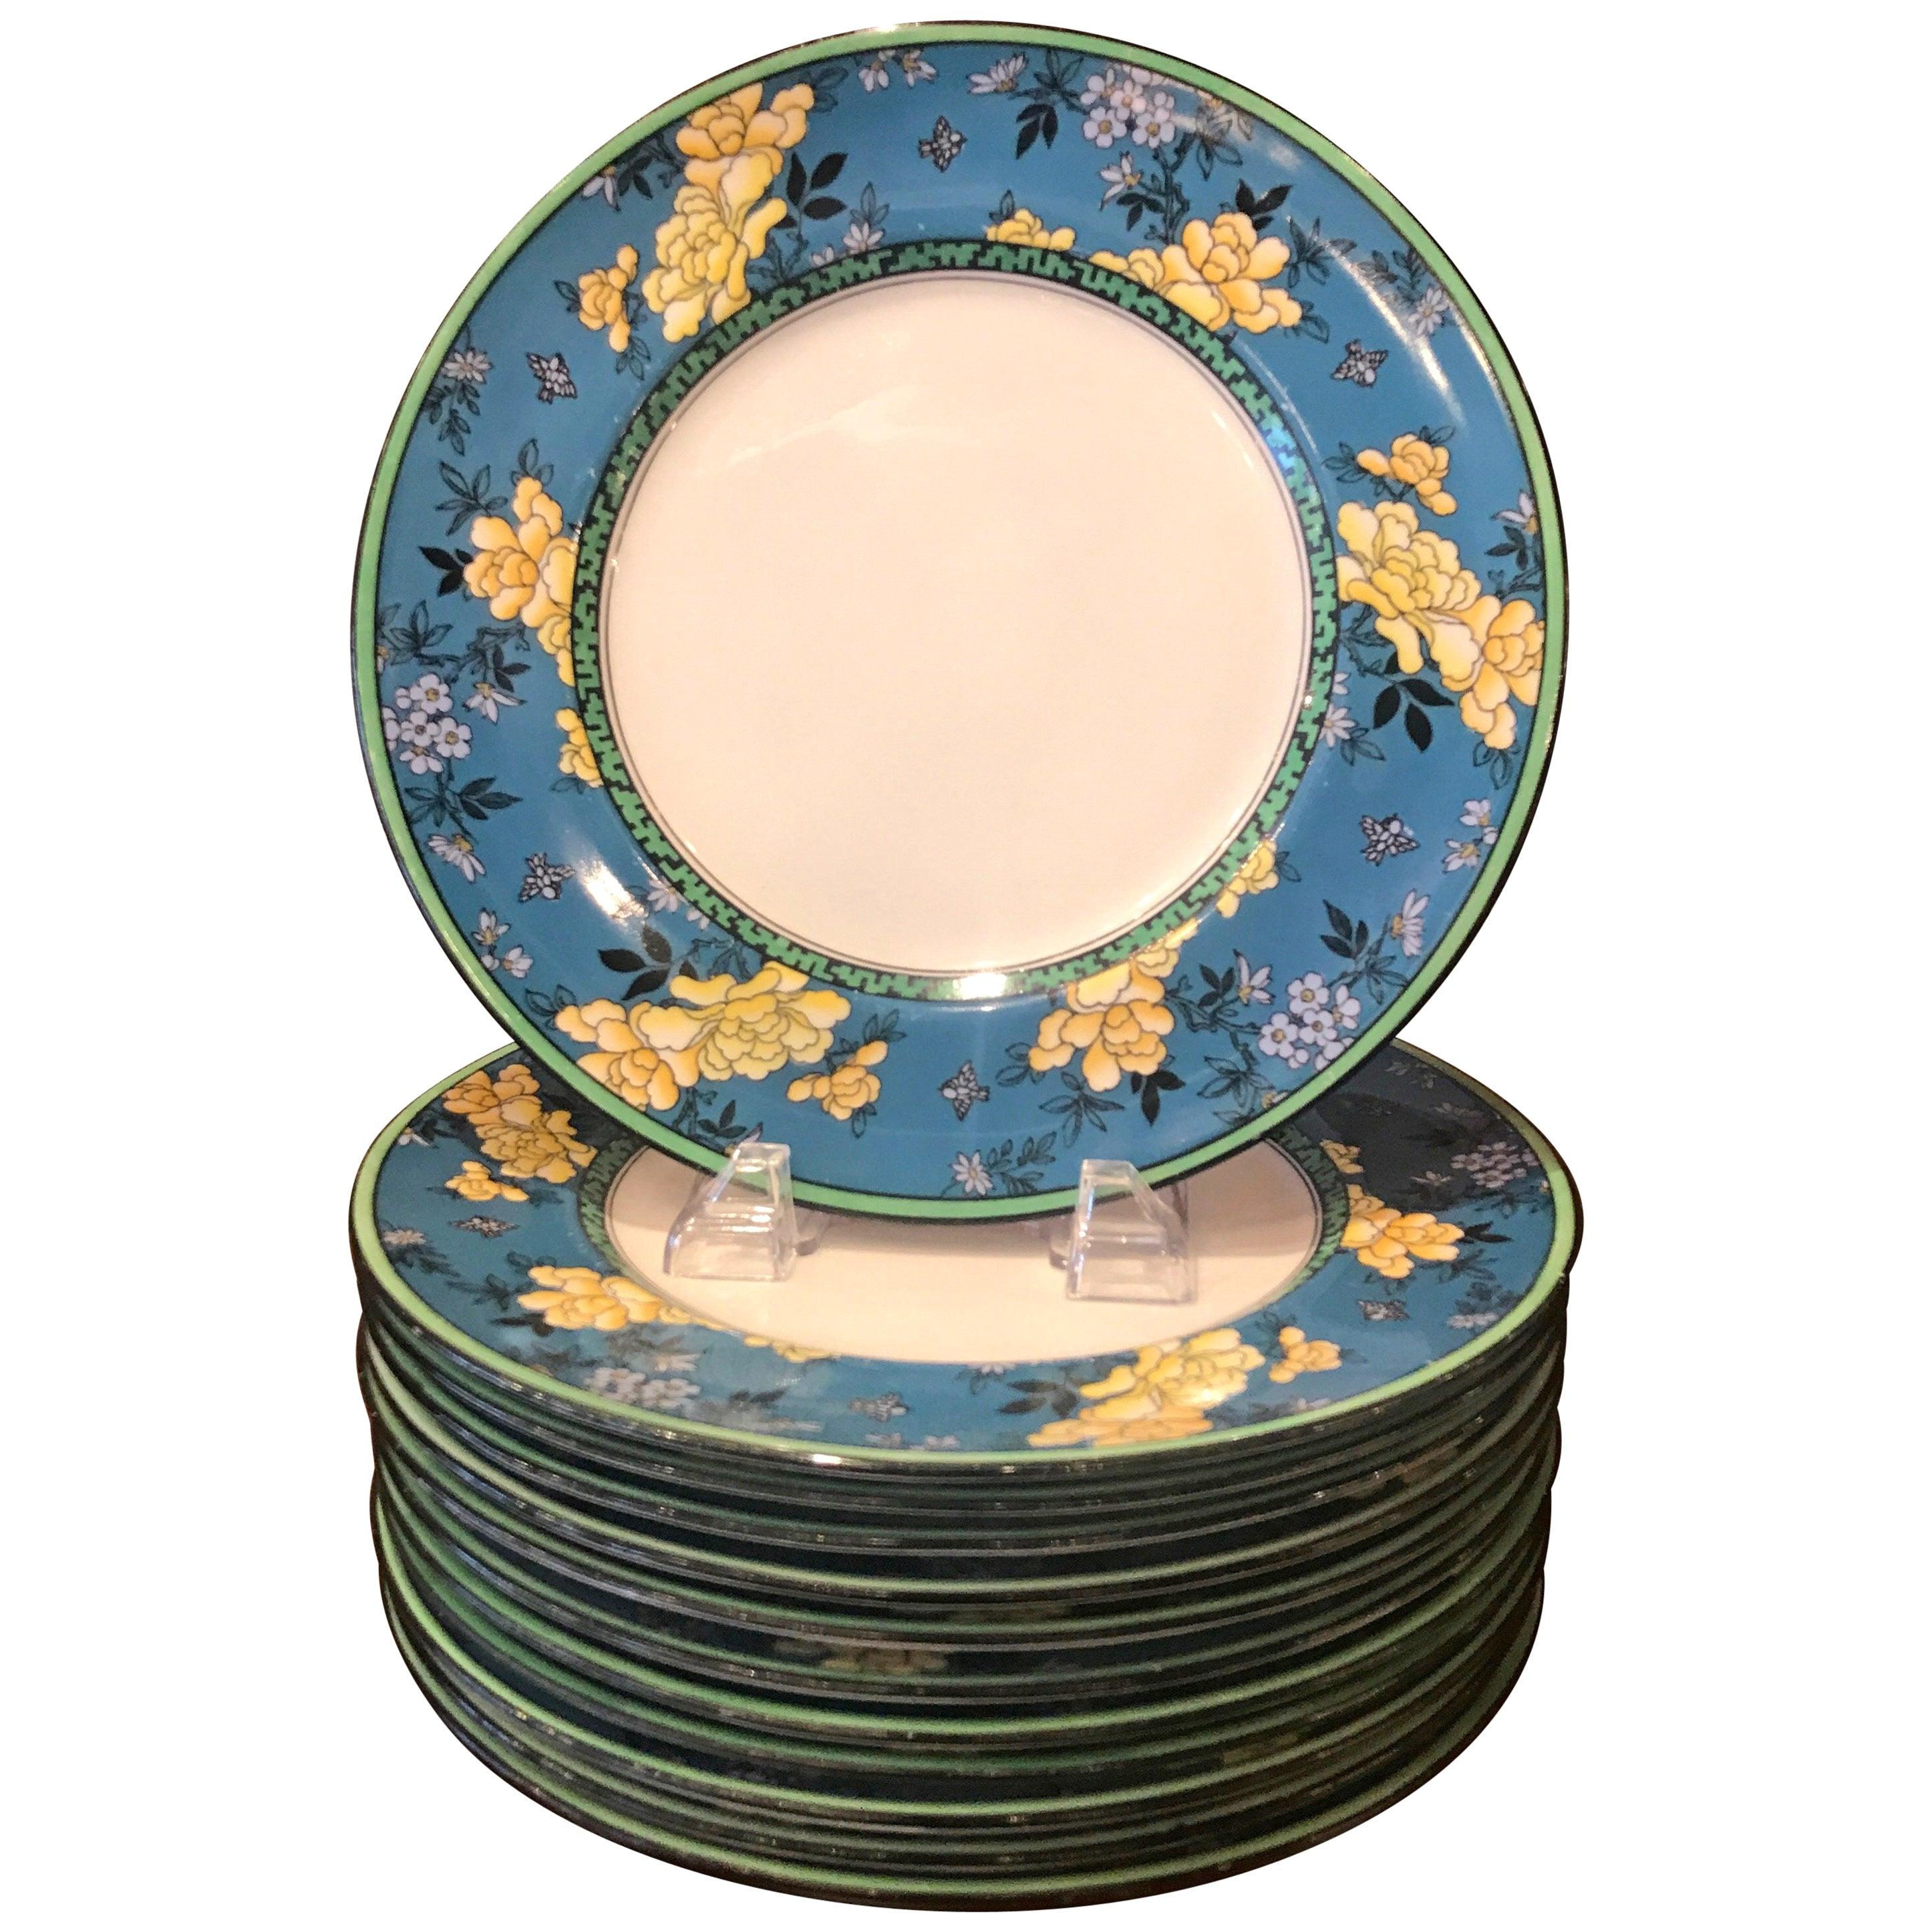 Set of 12 English Art Deco Plates, 1920s